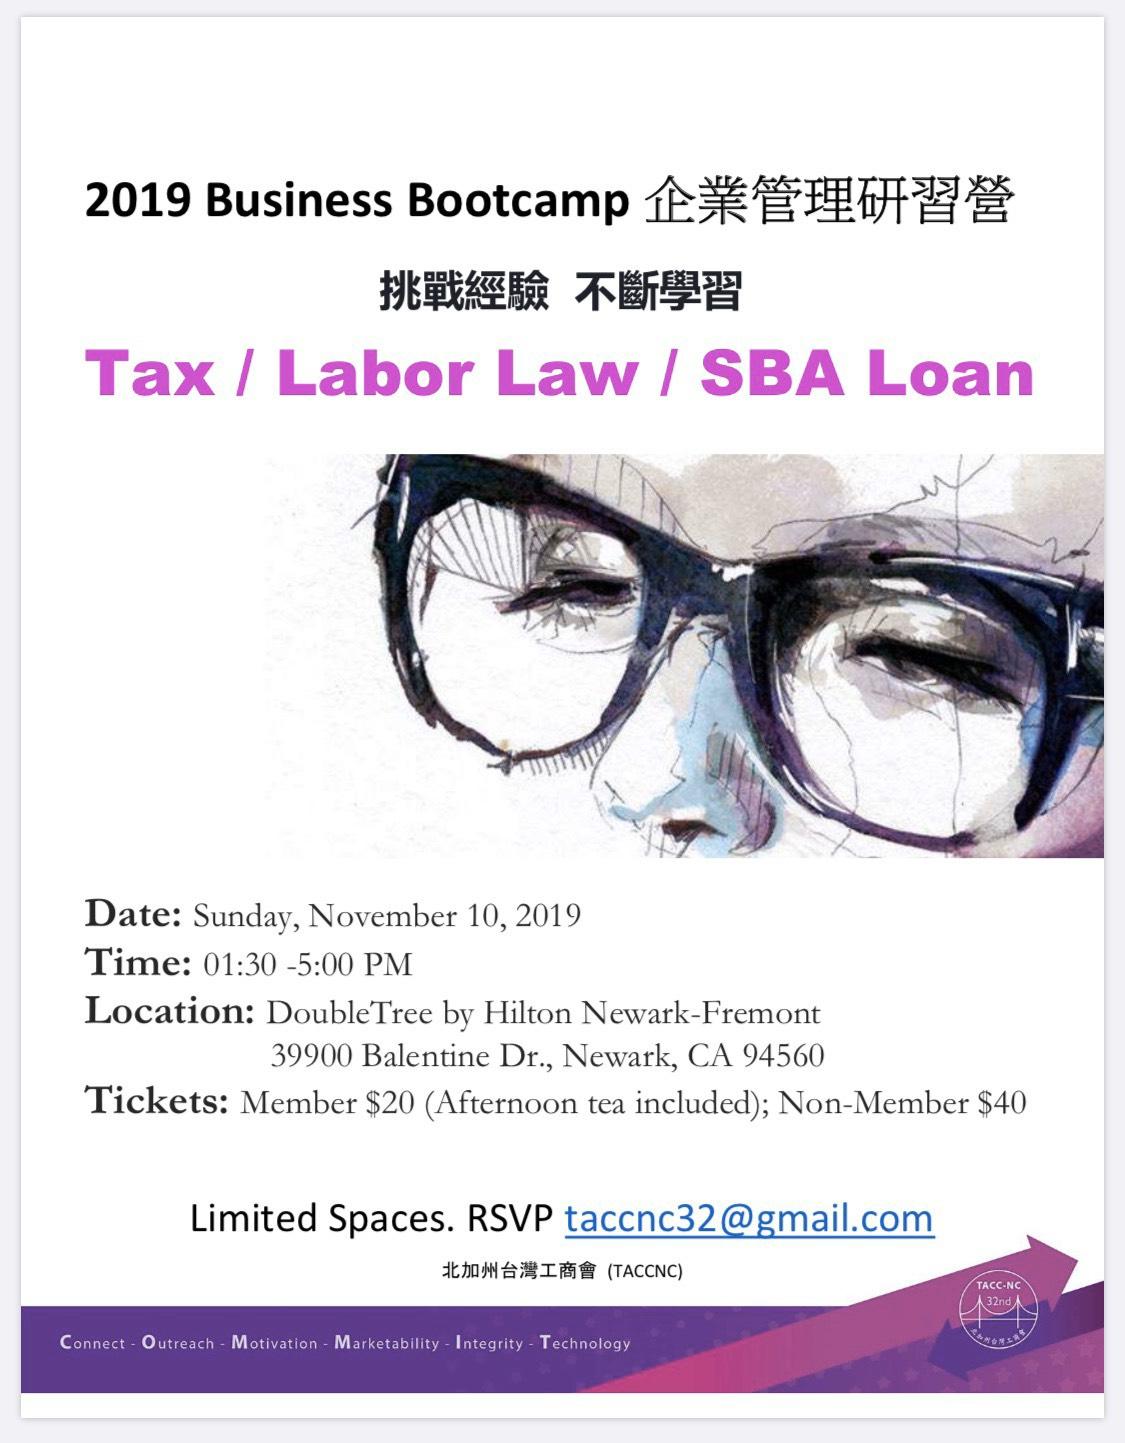 Bisiness Bootcamp Nov/10/2019